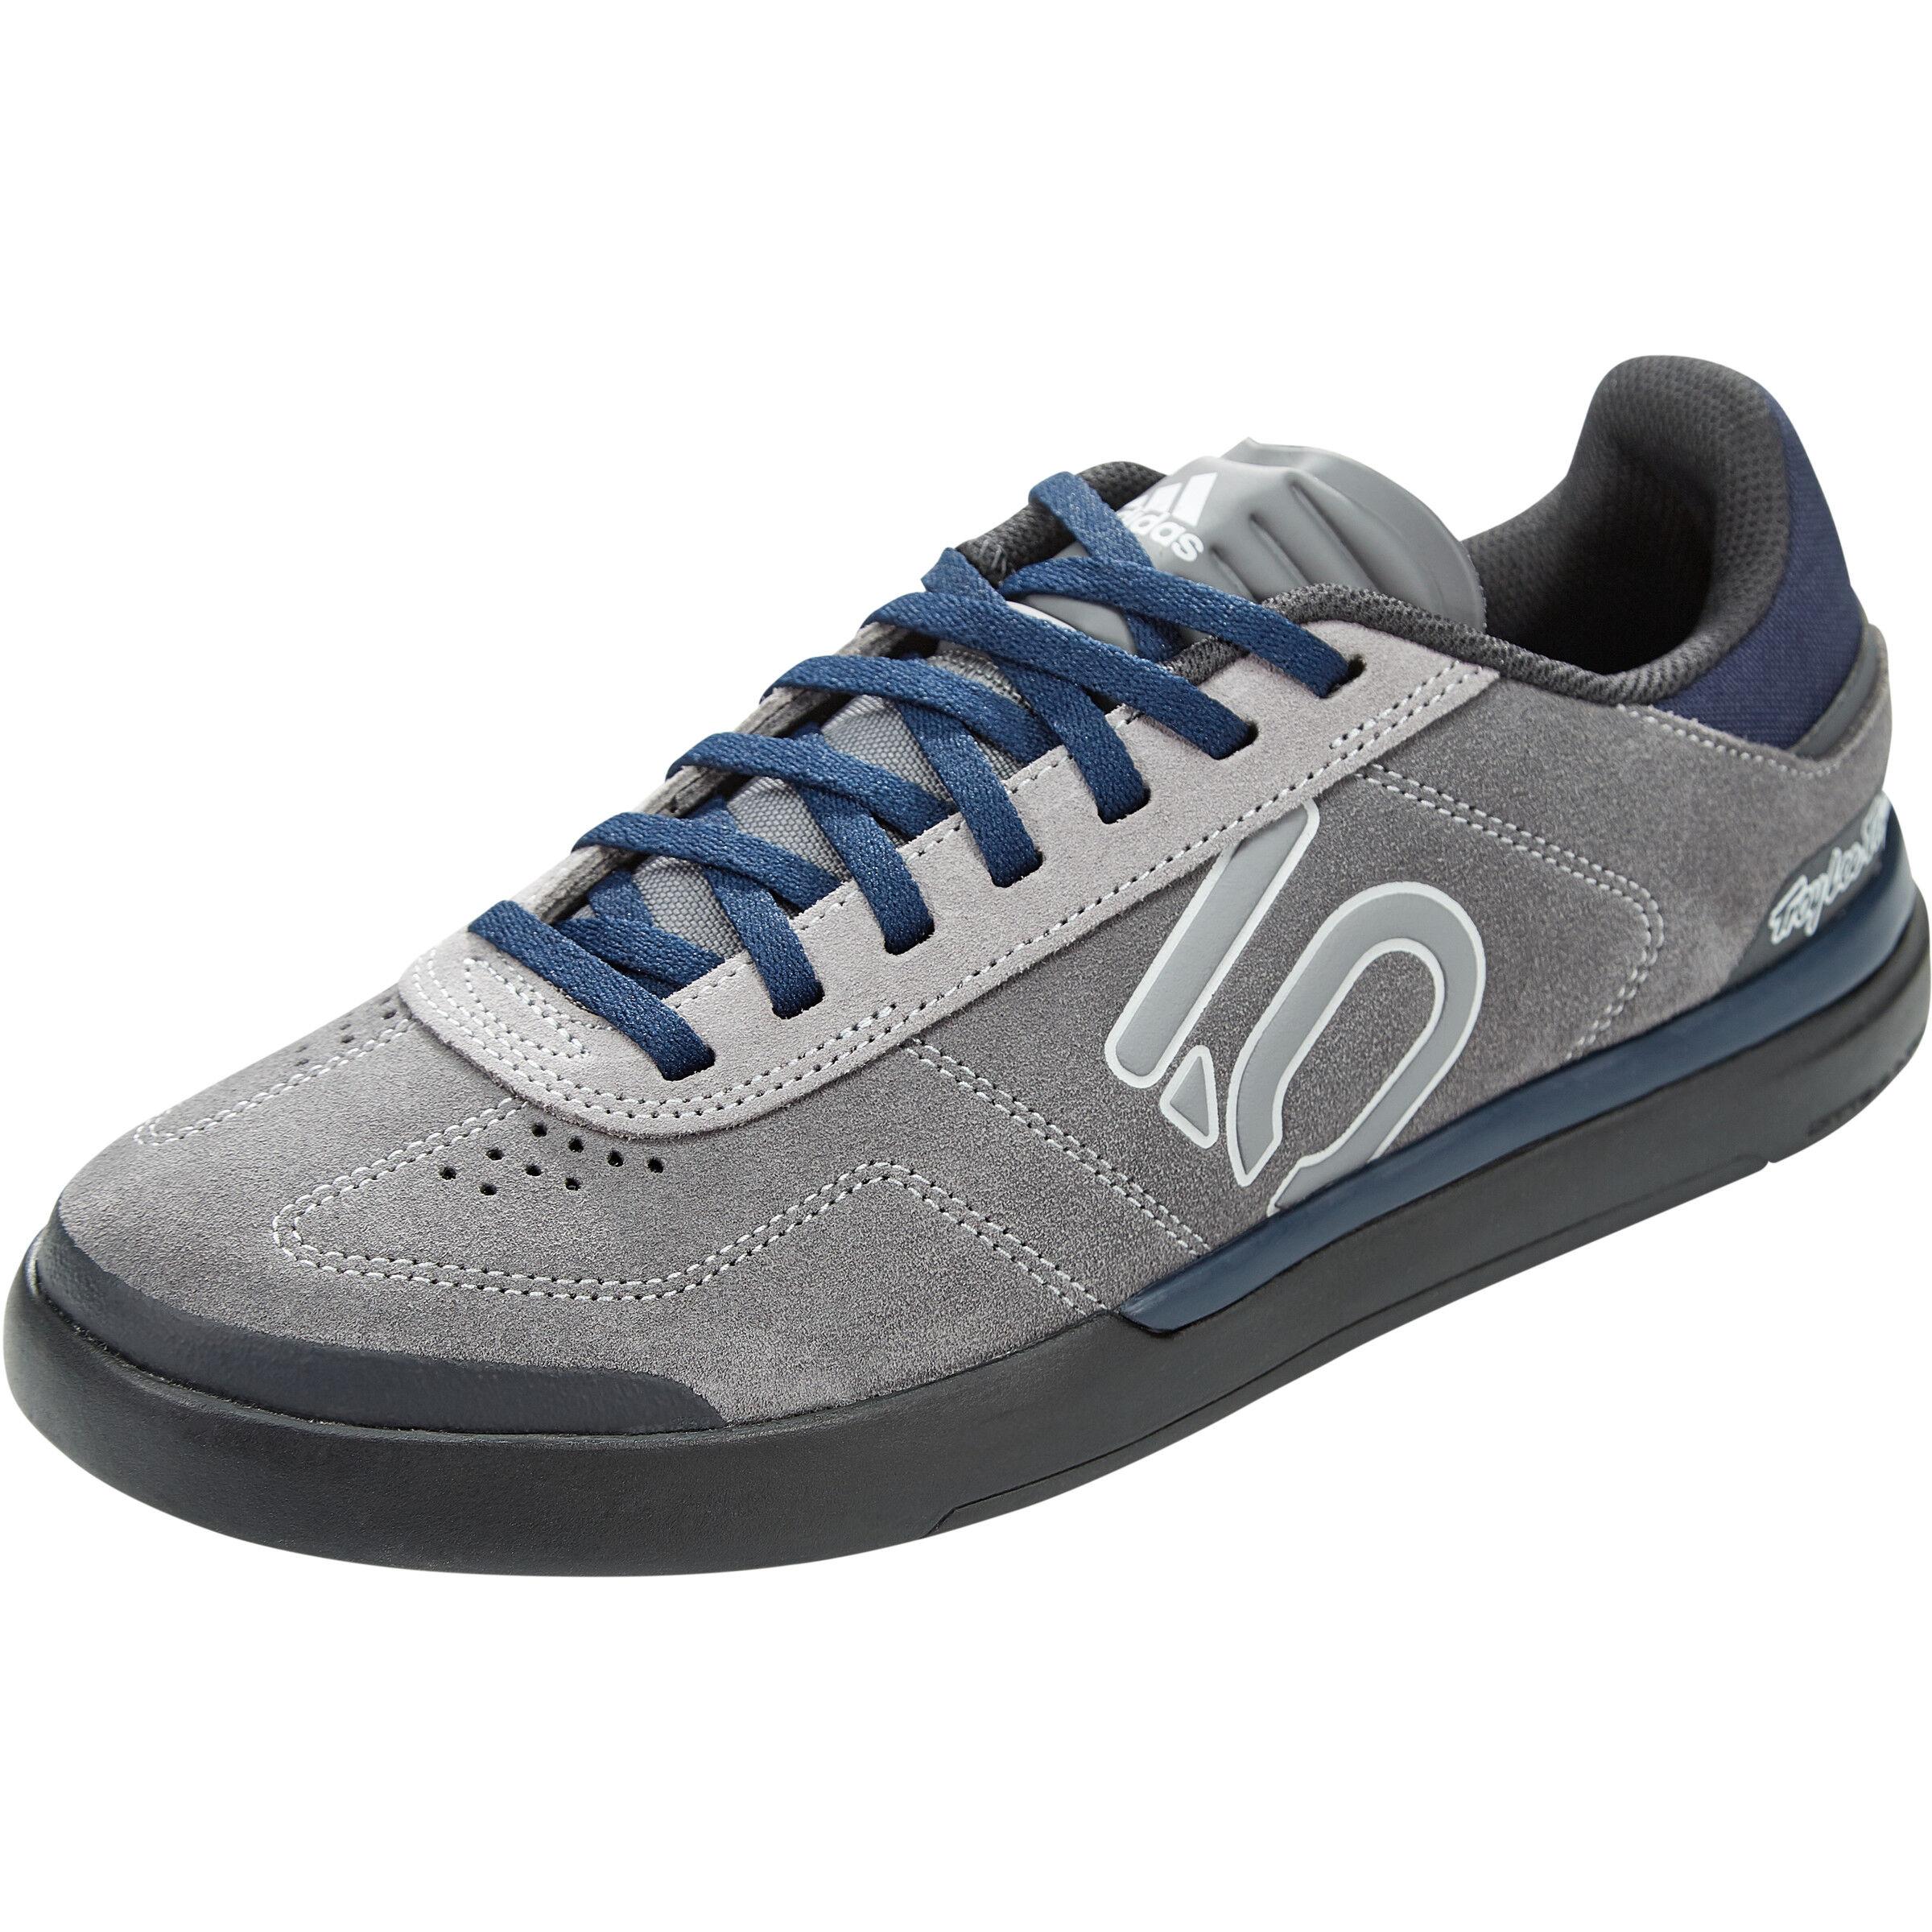 greycollegiate navy Low Herren threeclear adidas Sleuth grey TLD Five Schuhe Ten Cut DLX DIHWE92